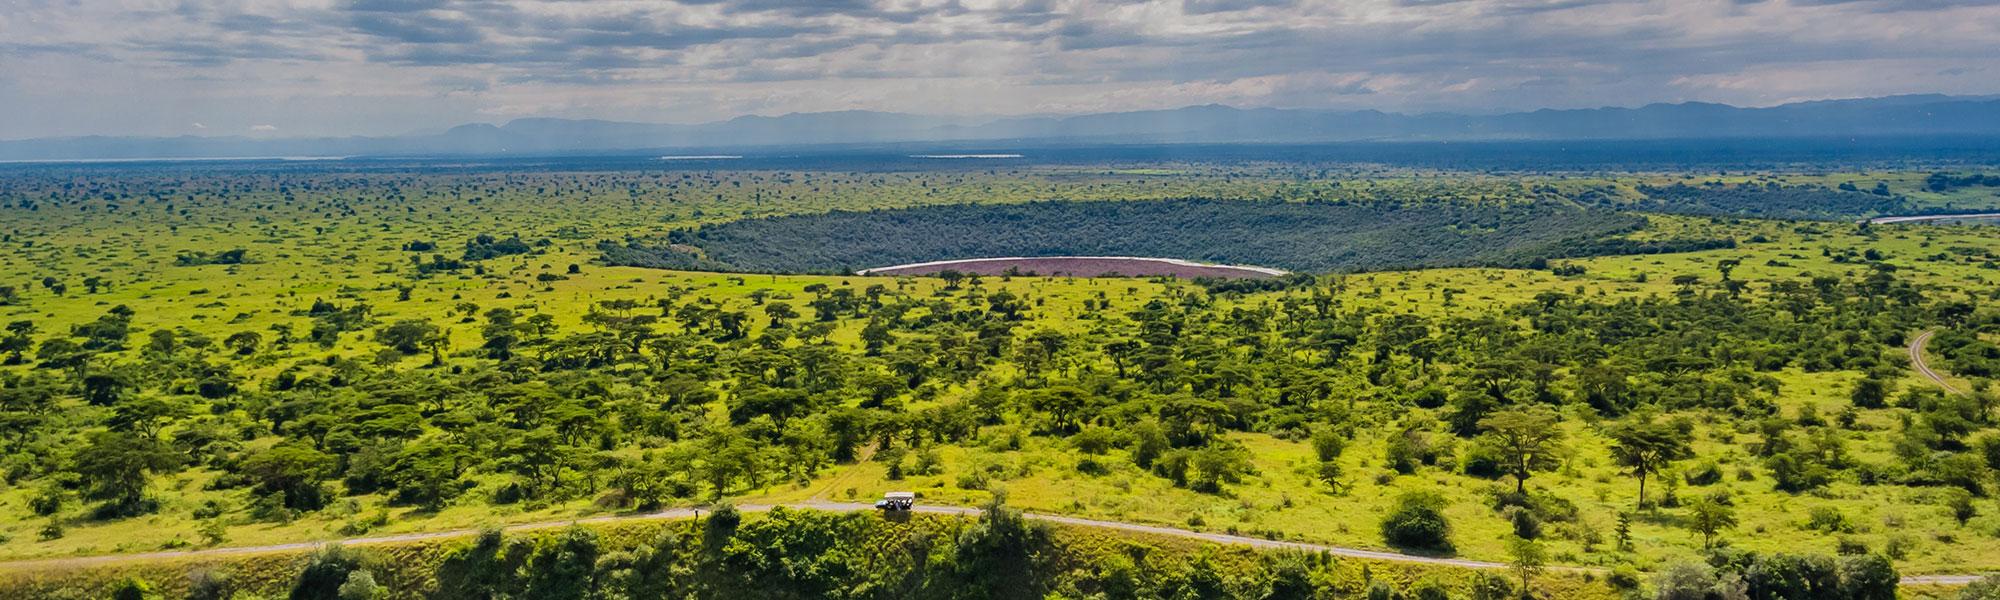 Wild Excursions Uganda The Best Tour Company